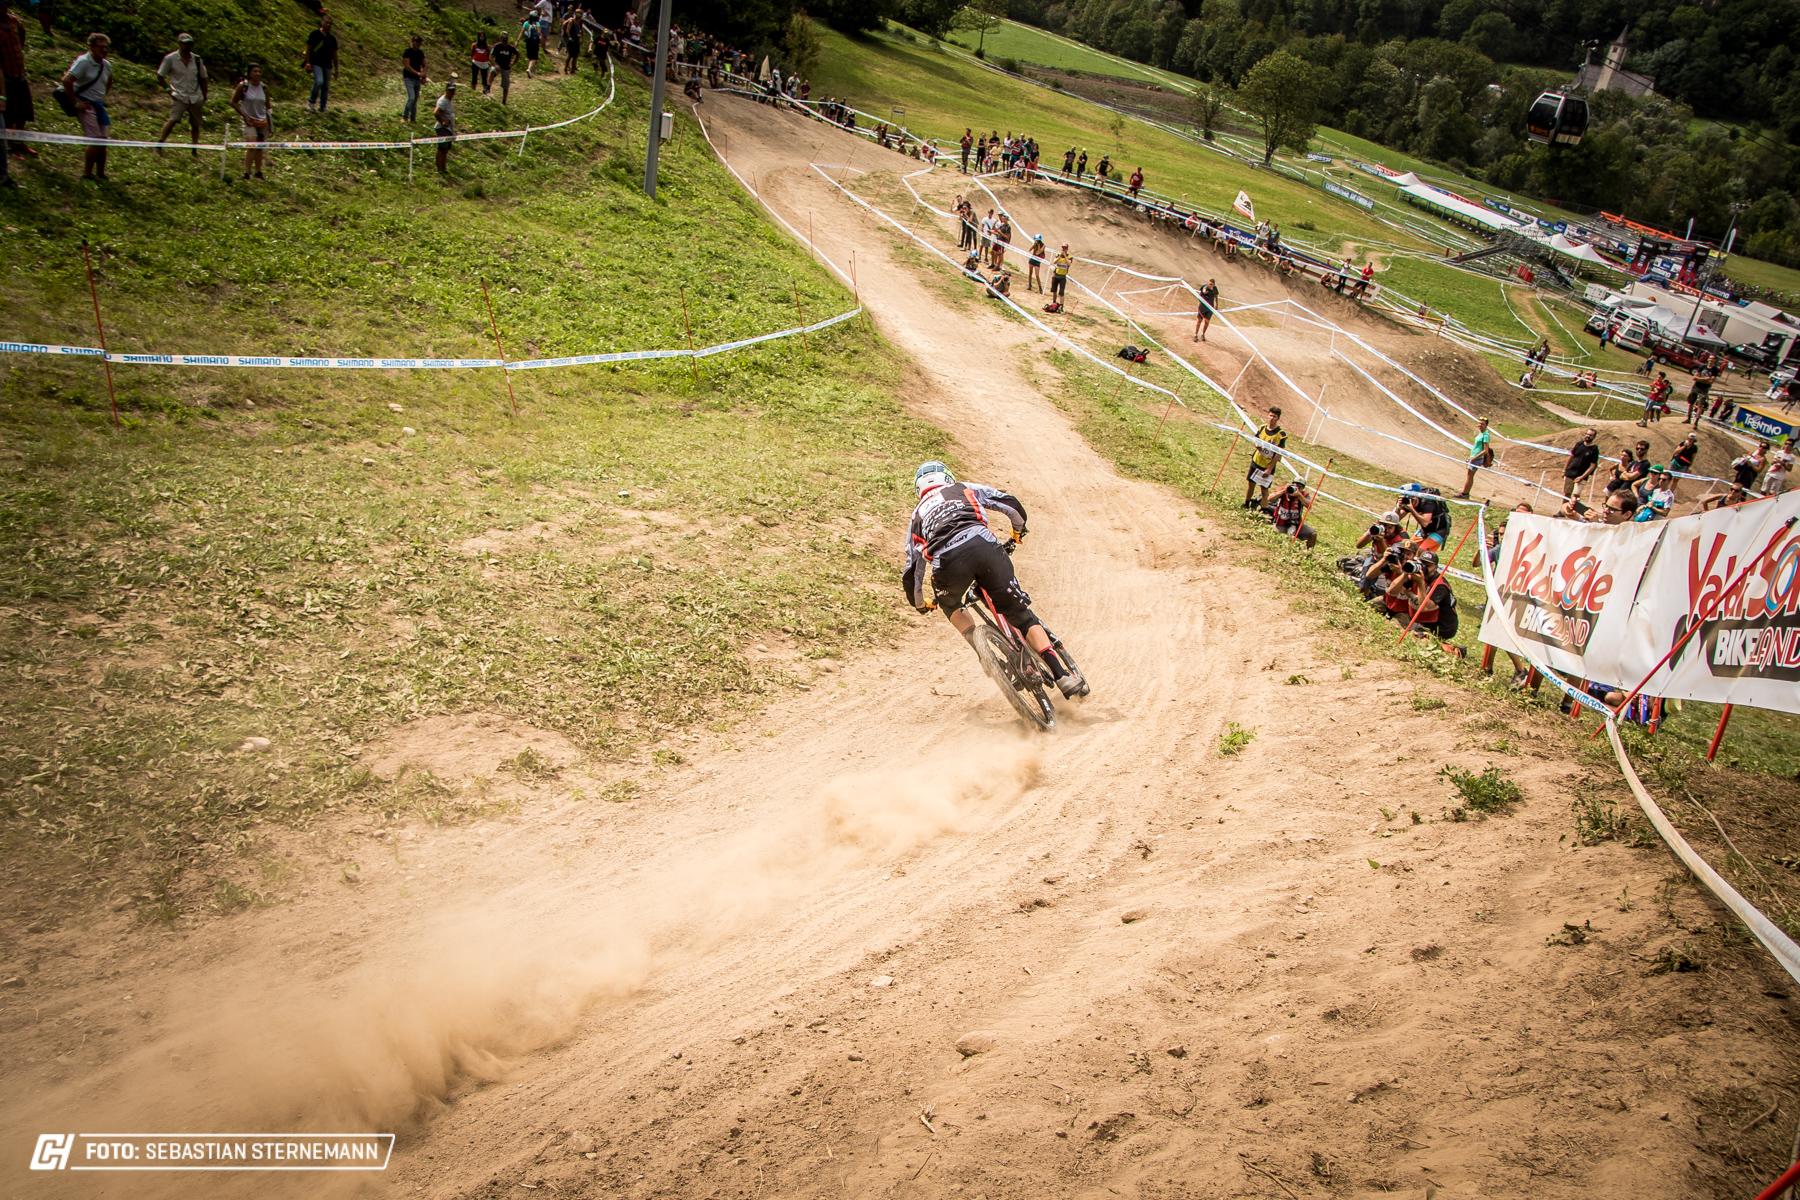 Saturday Val di Sole146 Cycleholix